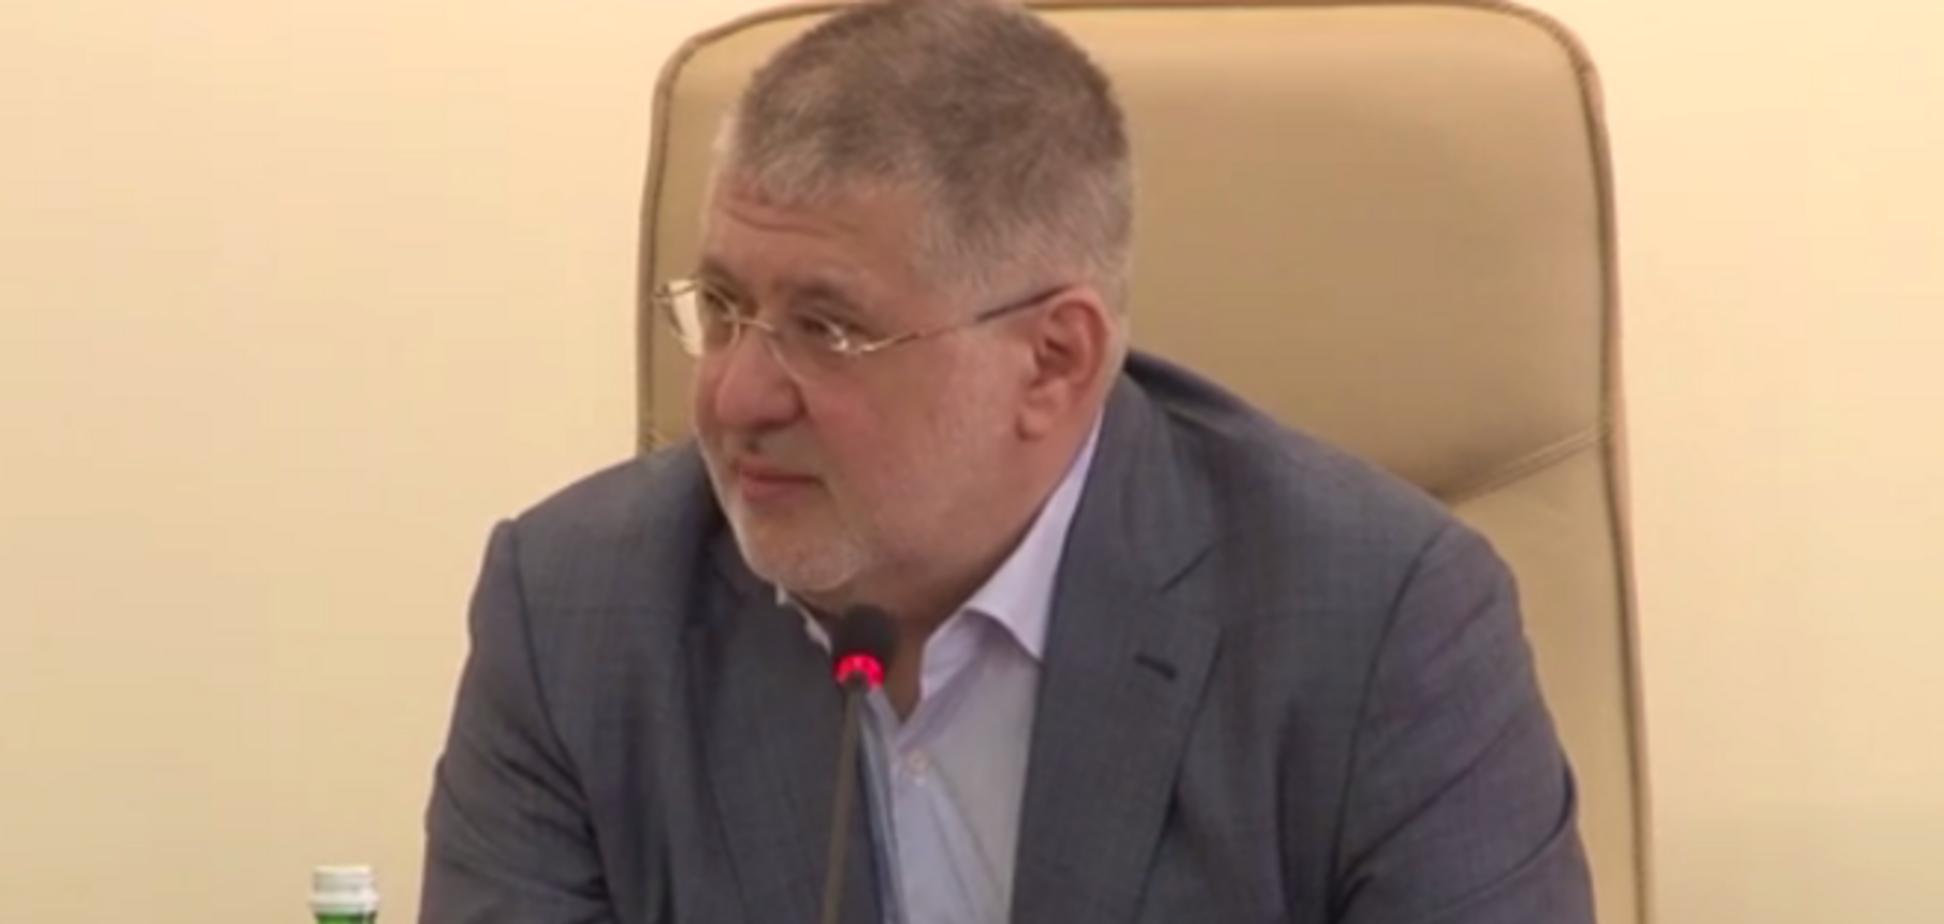 Коломойский подаст против России иски на $2 миллиарда